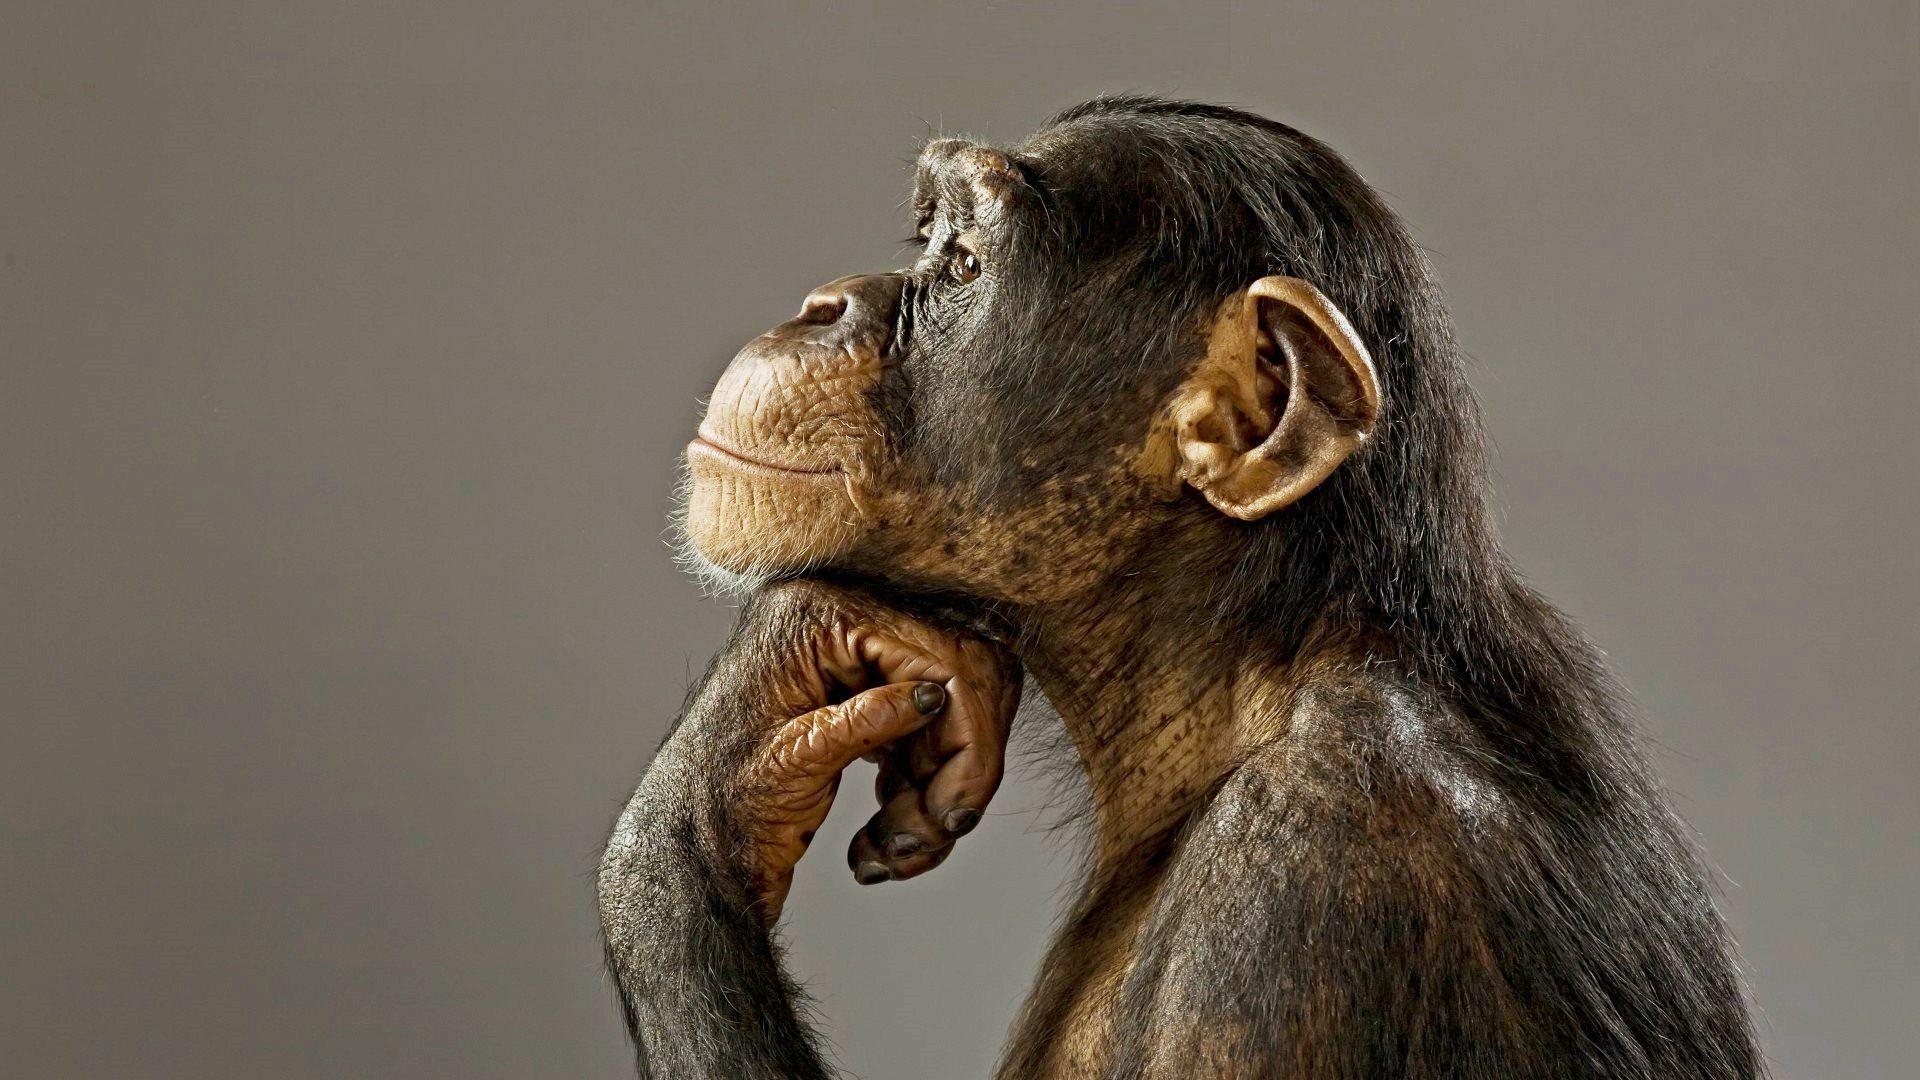 chimpanzee-wallpaper-funny-baBy.jpg